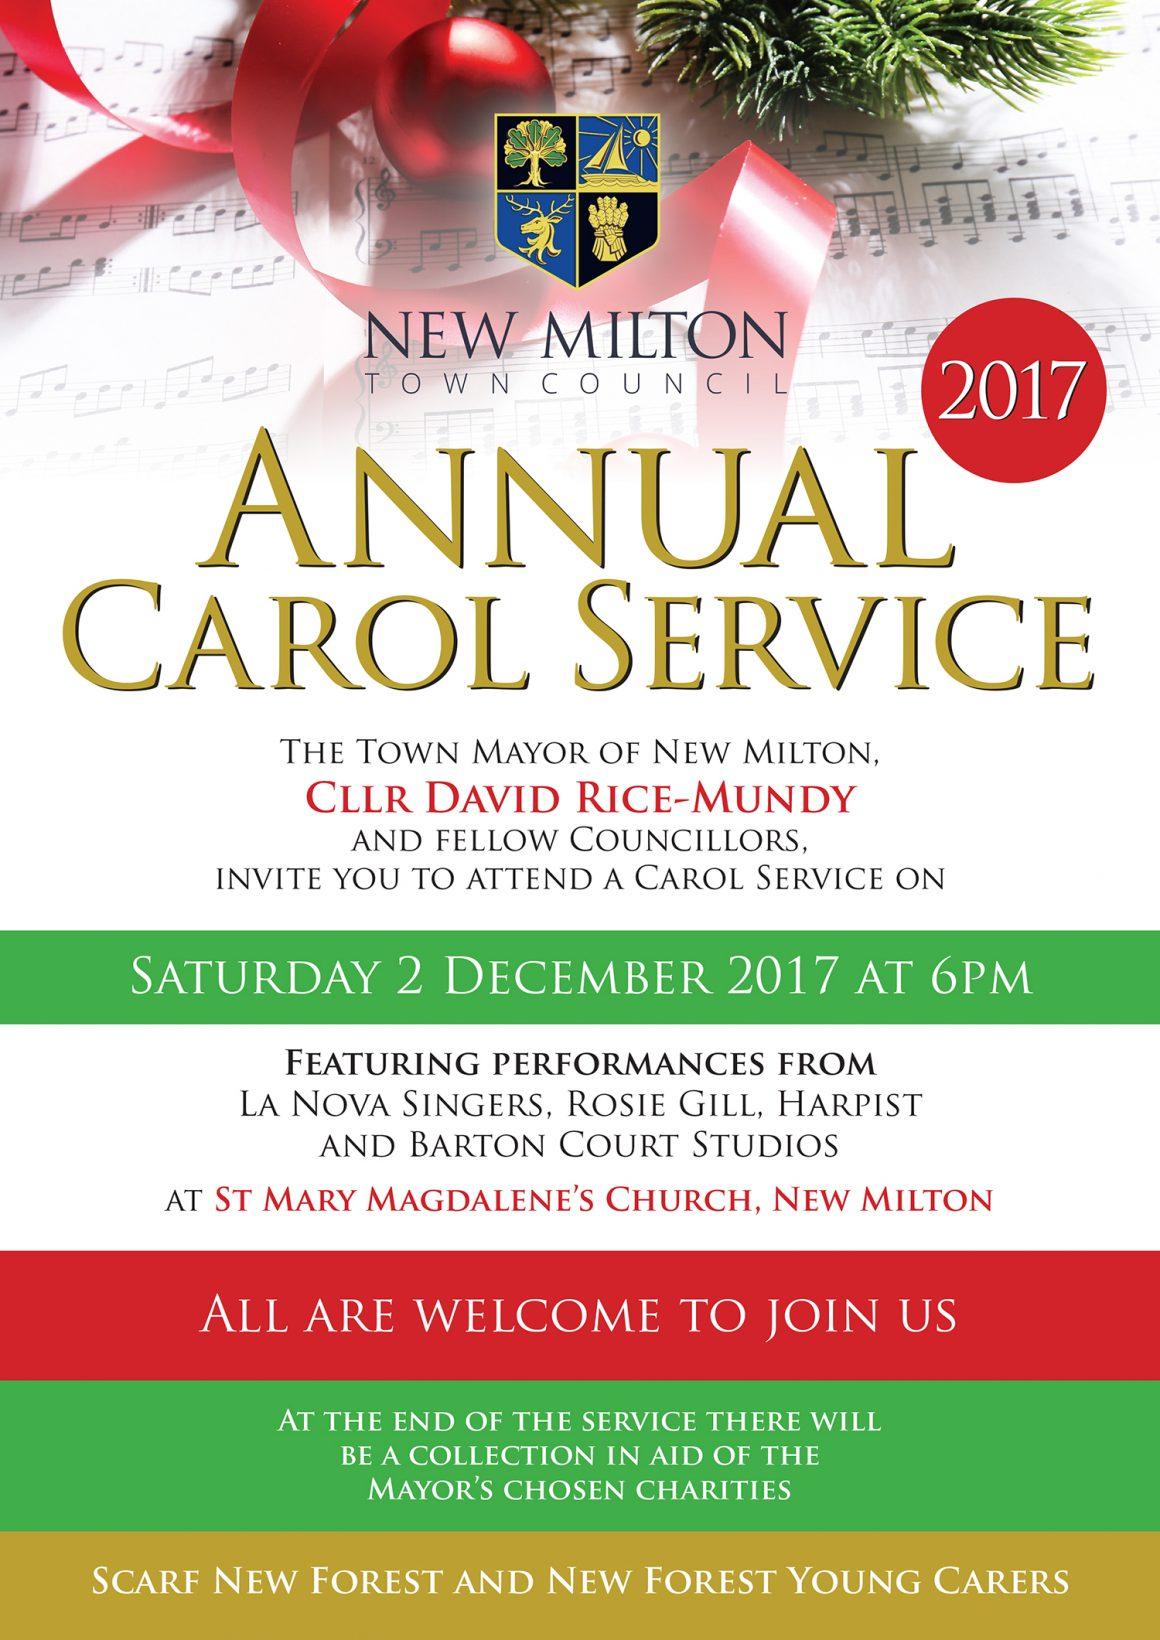 Annual Carol Service